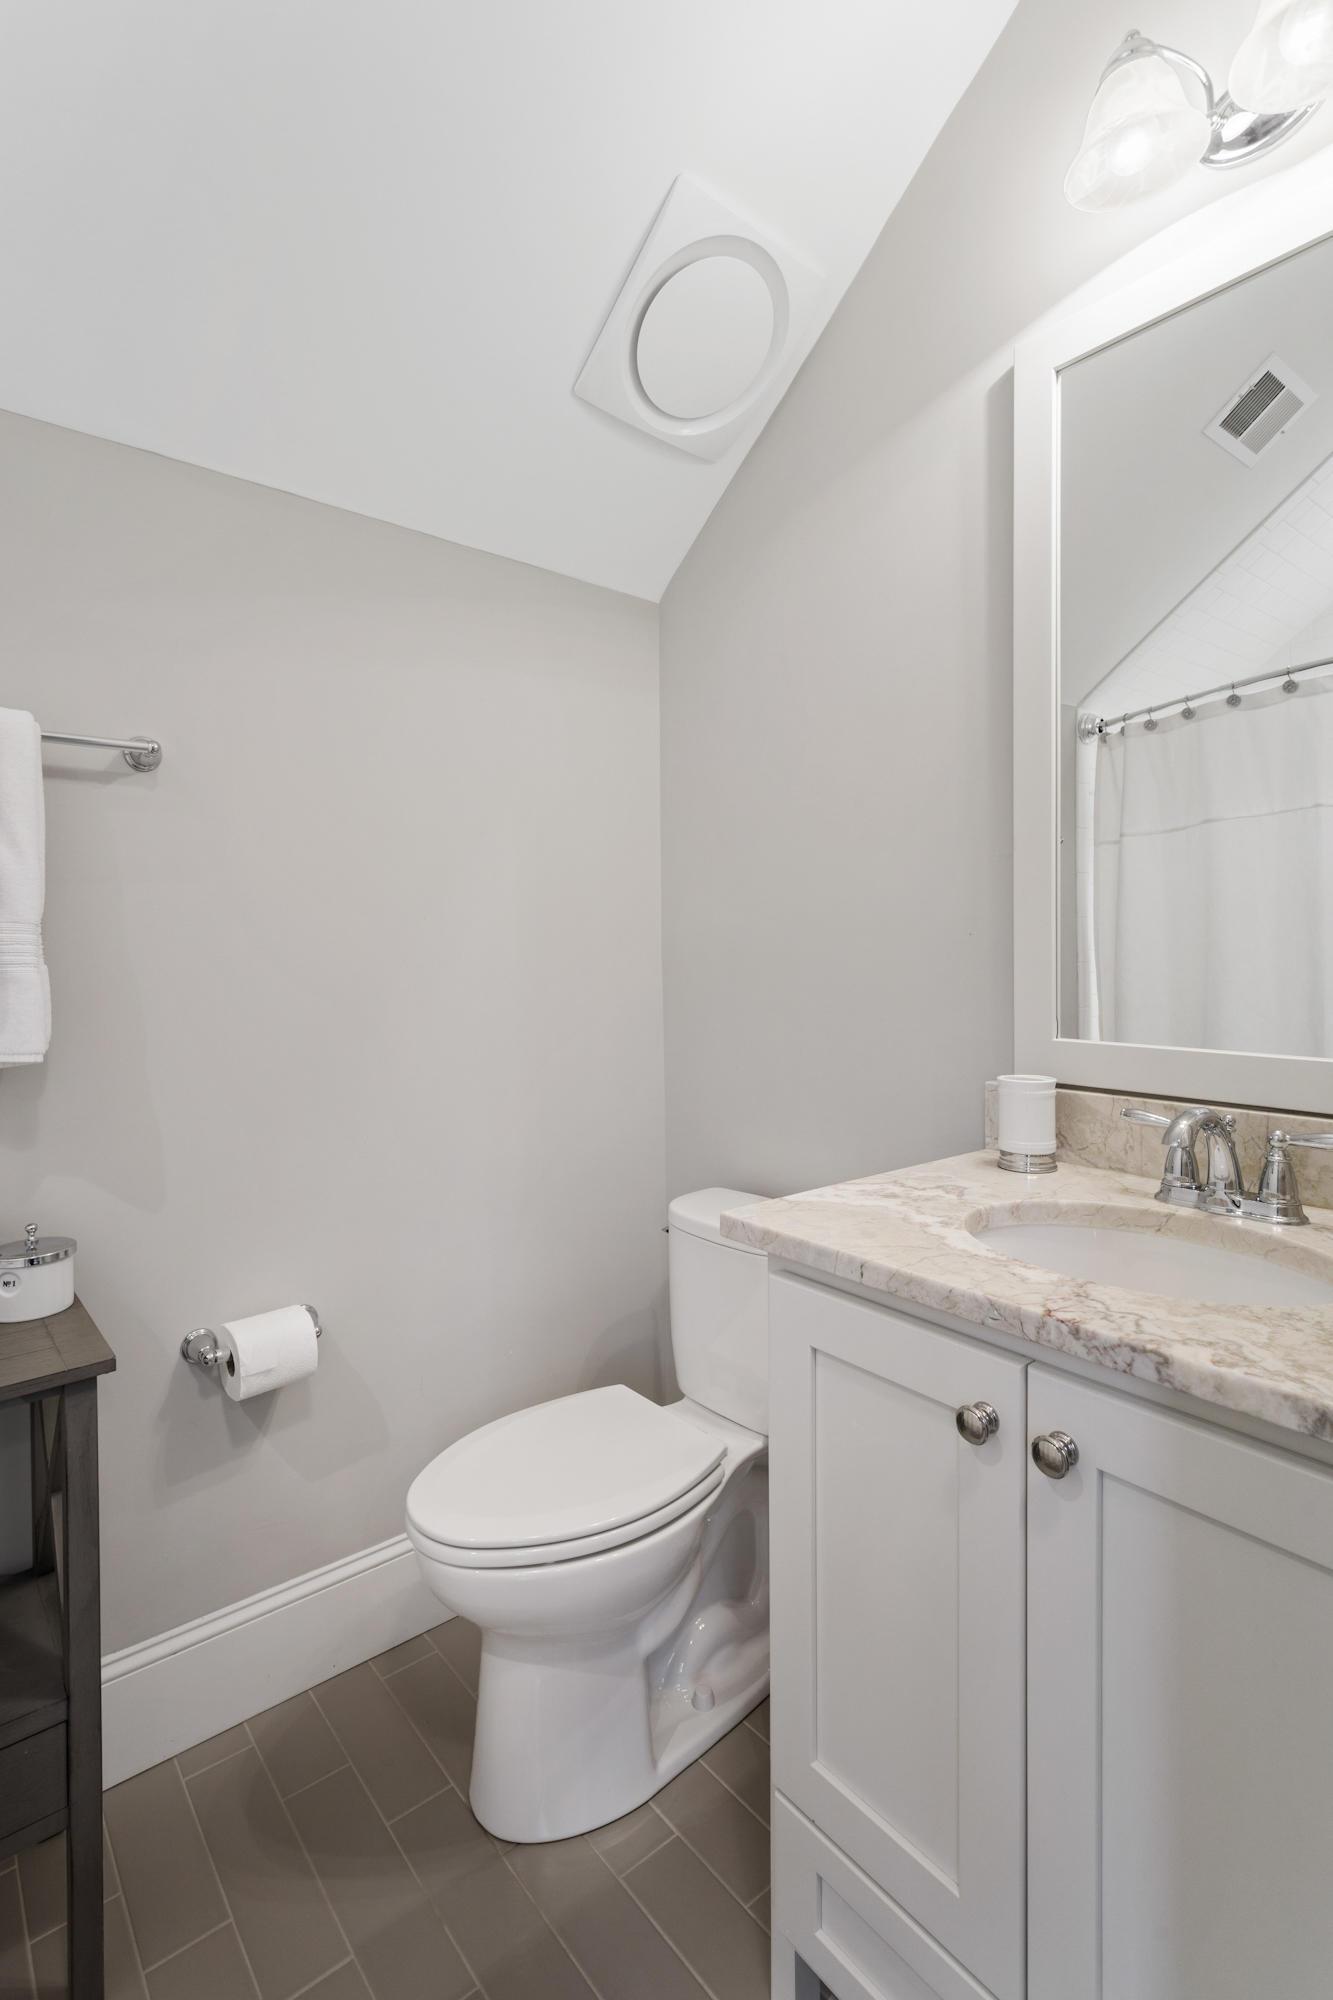 Daniel Island Park Homes For Sale - 458 Lesesne, Charleston, SC - 31